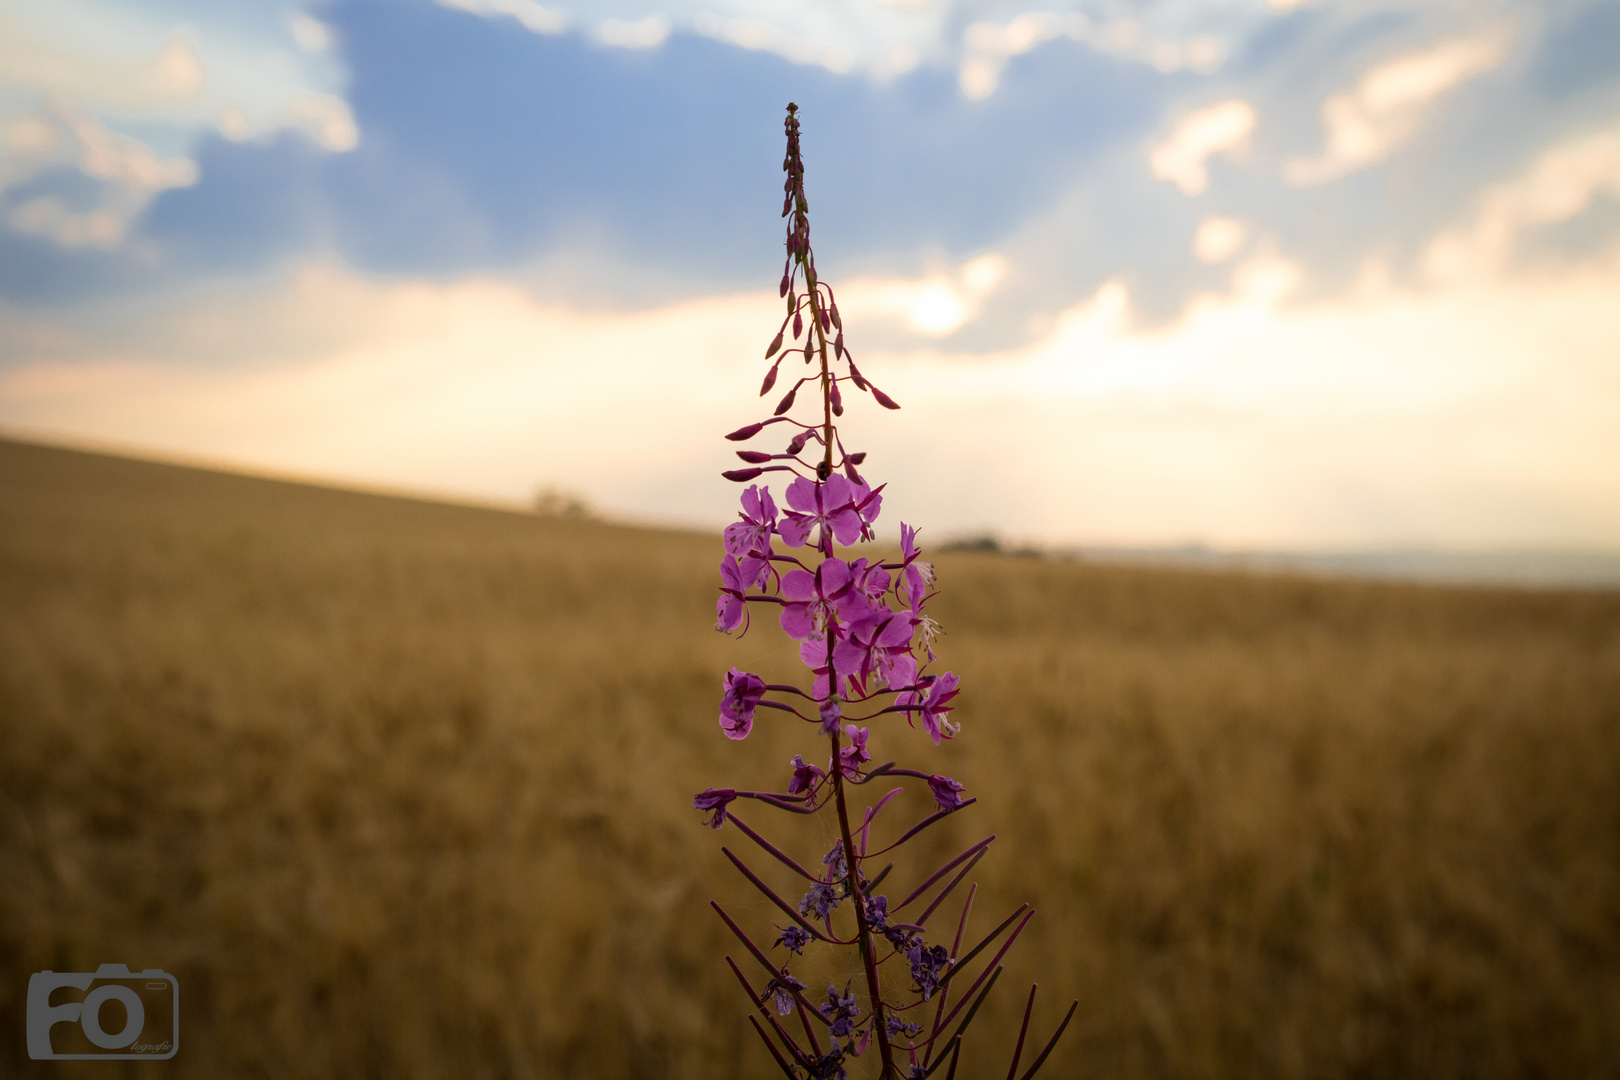 Blume am Feldweg